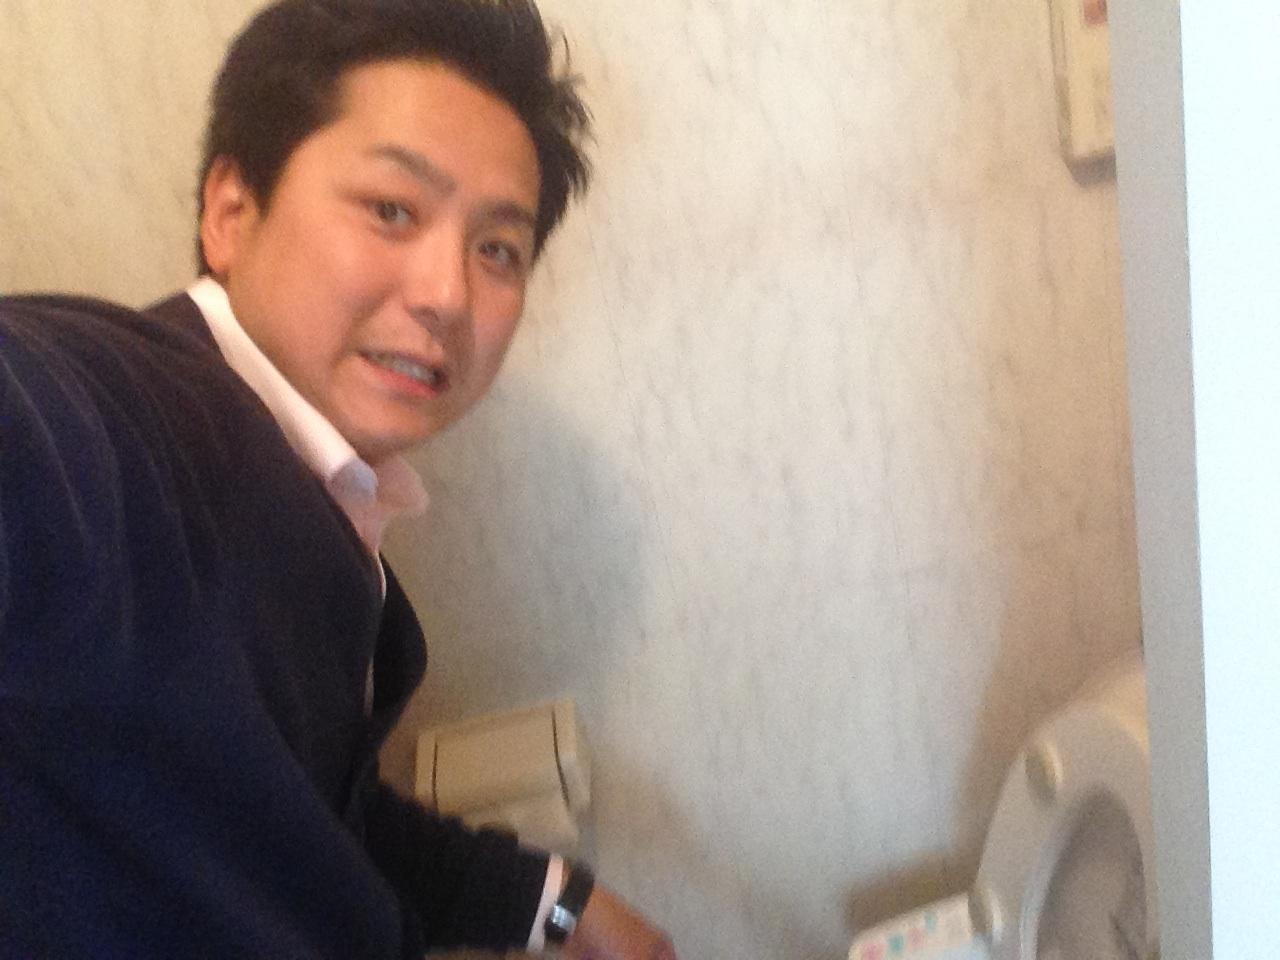 T様モビリオスパイク納車☆ラパン・タント・ライフ・ムーヴ・ノア・ヴォクシー・店長クマブログ_b0127002_17503836.jpg